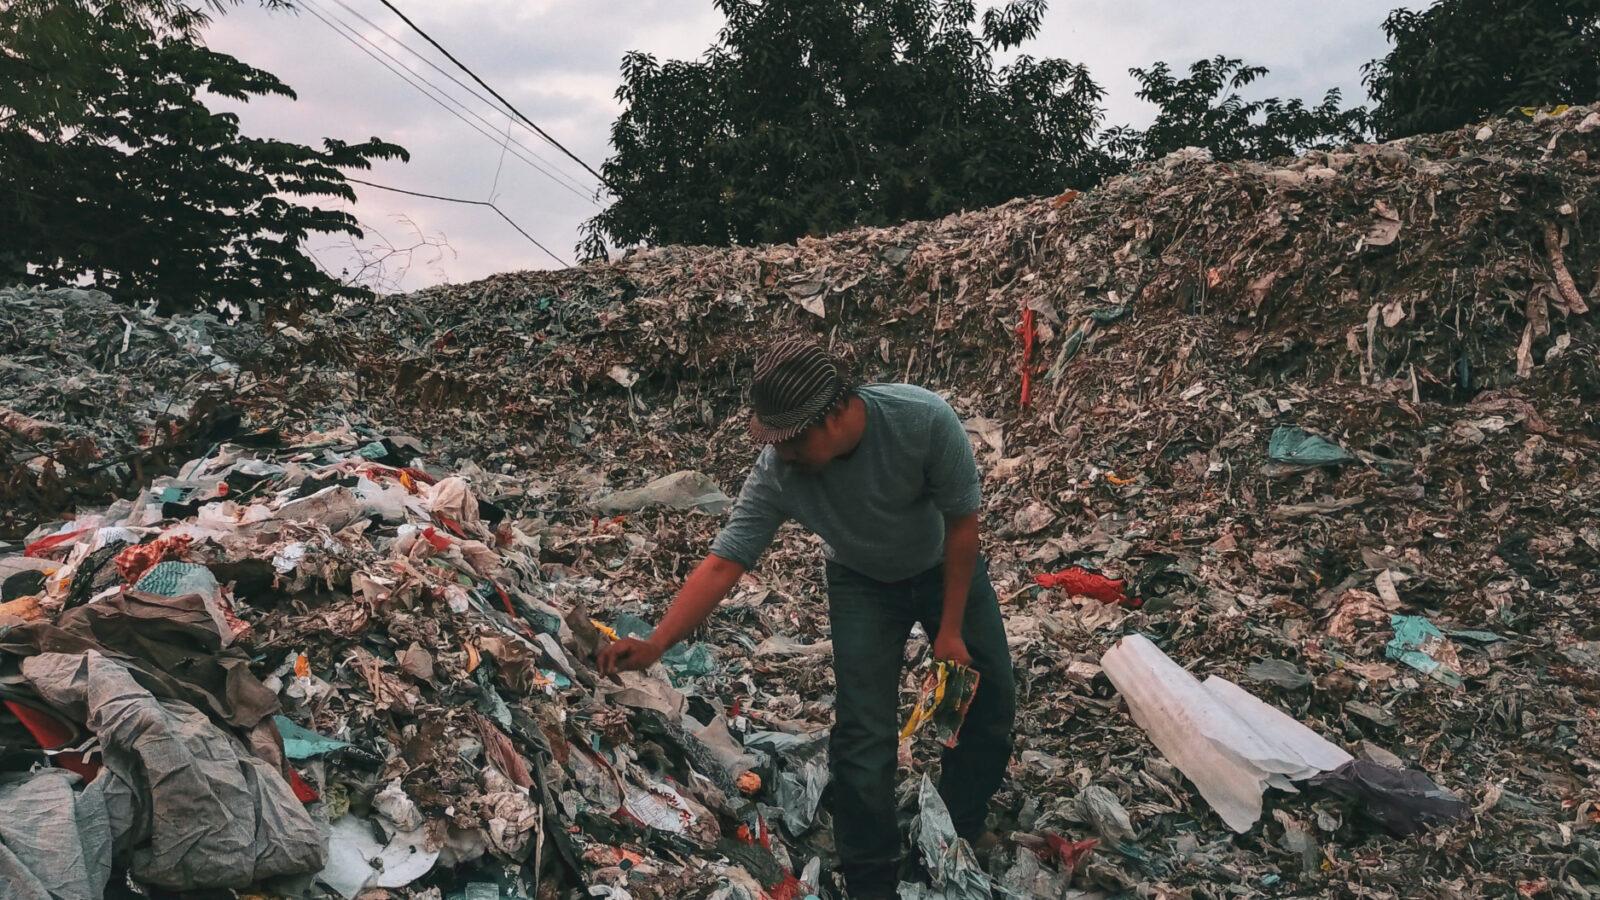 Story of Plastic